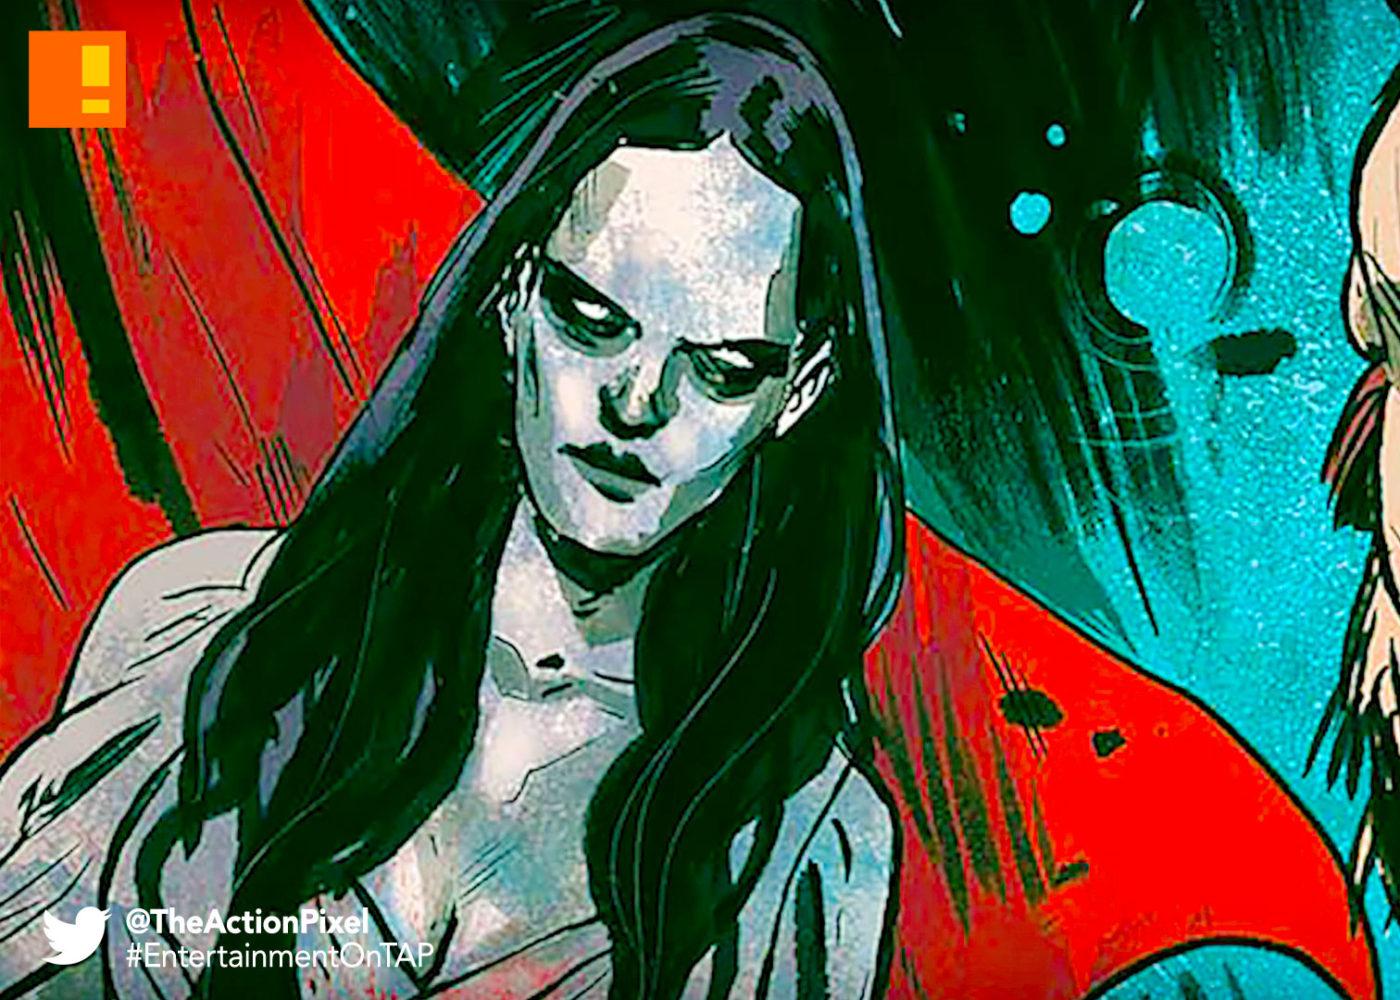 penny dreadful, the awaking, the action pixel, titan comics, showtime ,